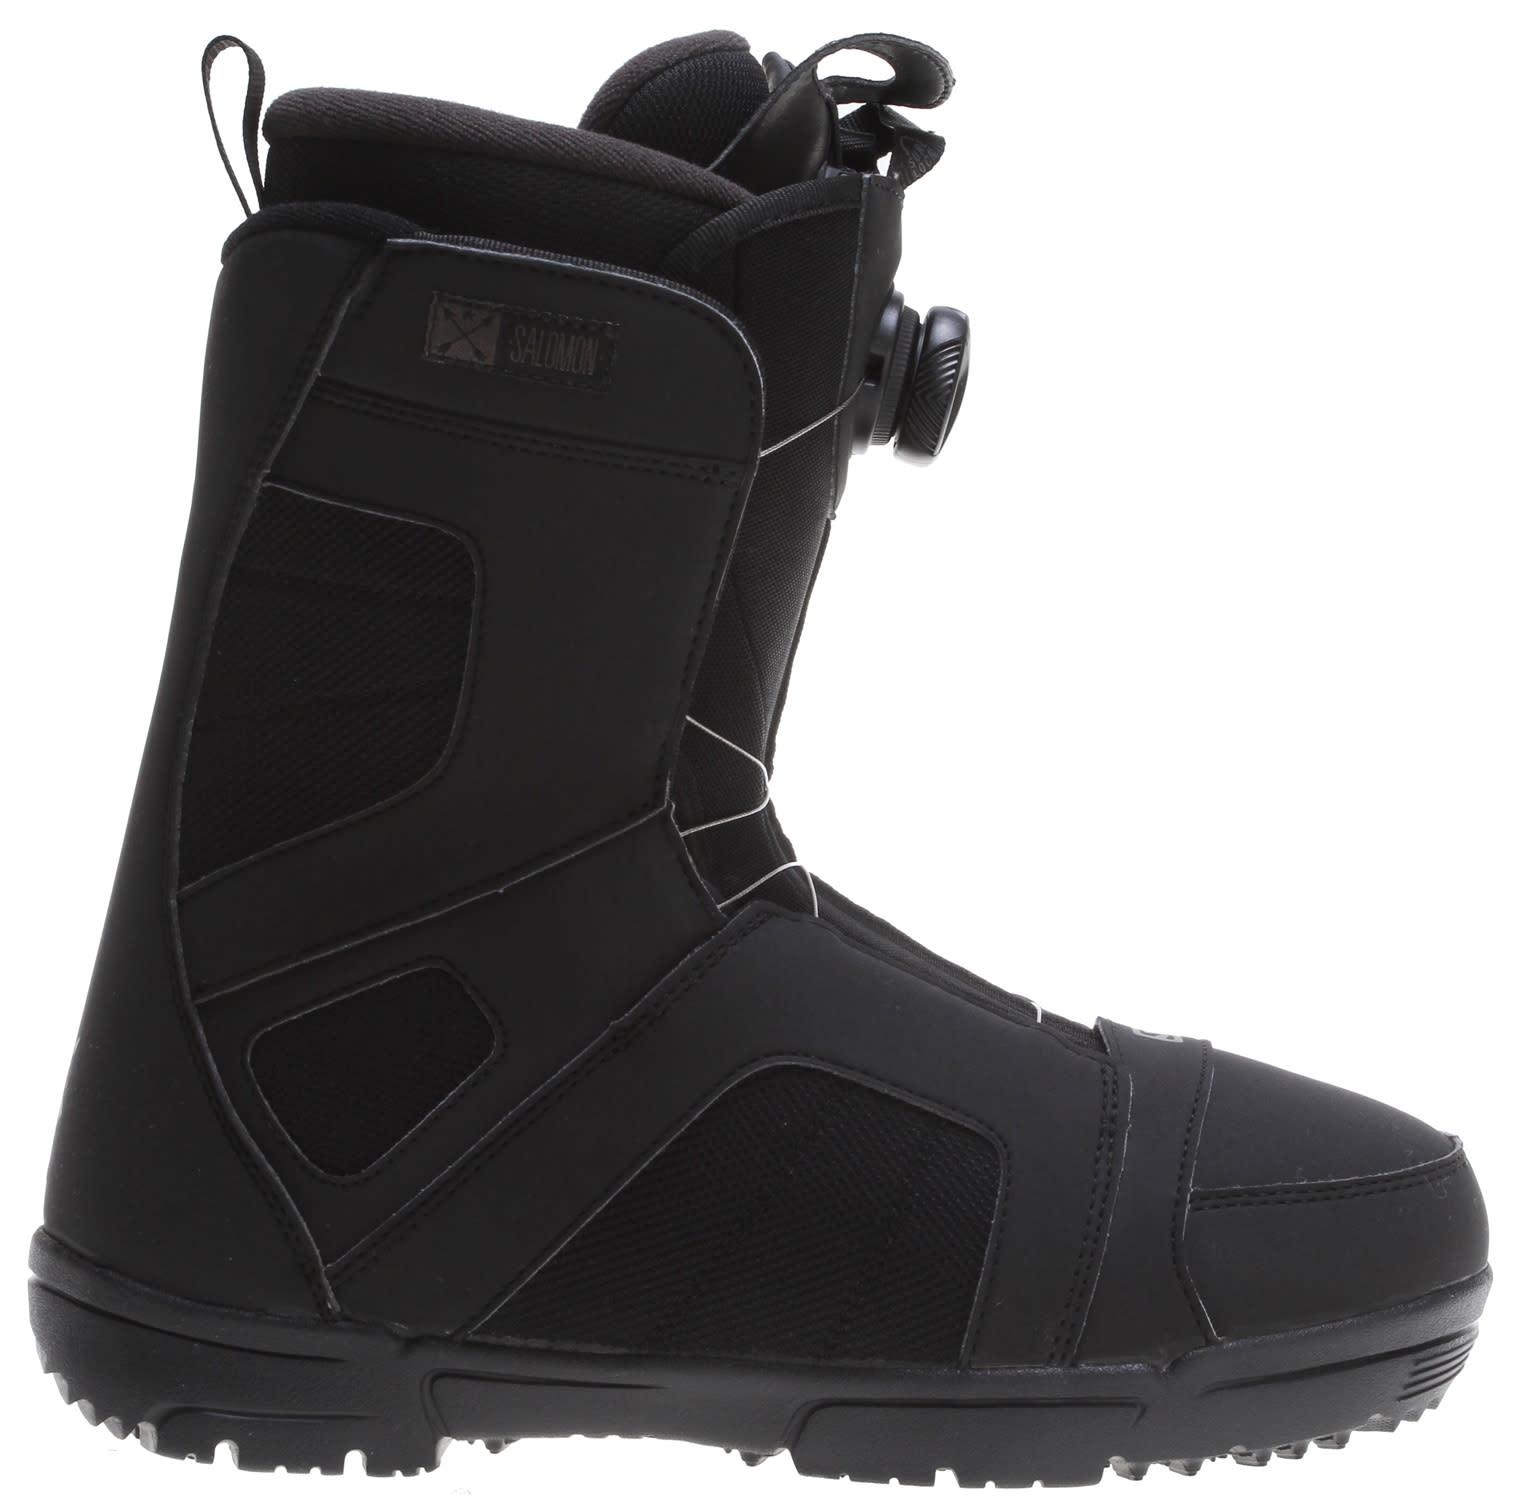 boots snowboard salomon,Salomon Ivy Boa Woman u0027s